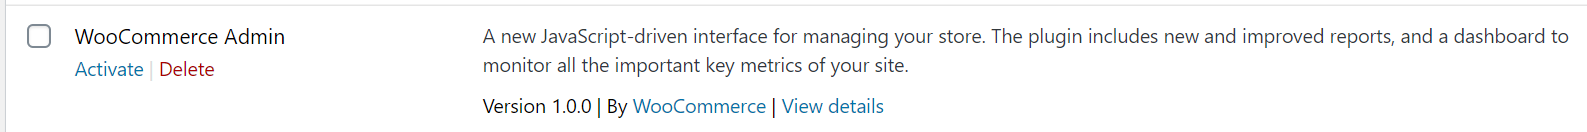 WooCommerce Admin Feature Plugin